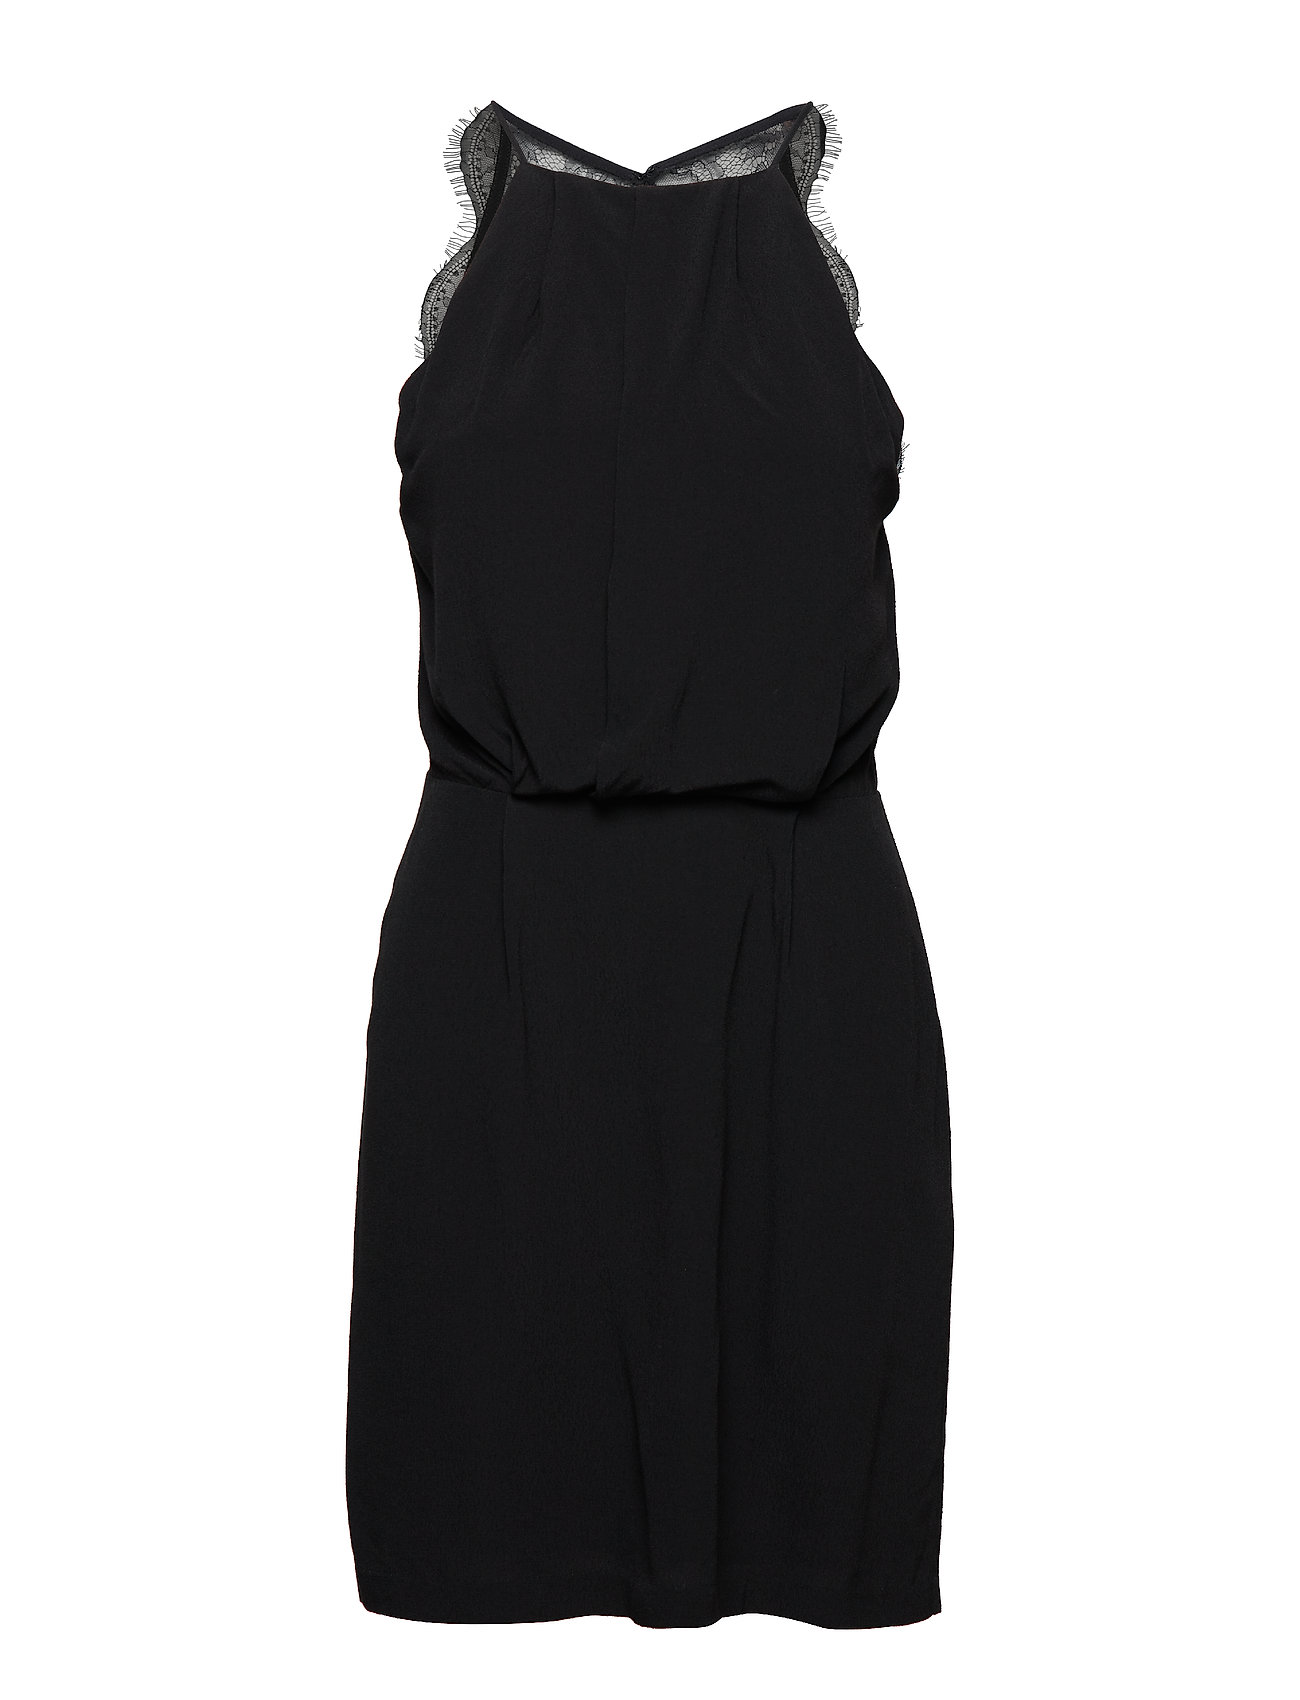 Samsøe Samsøe Willow short dress 5687 - BLACK